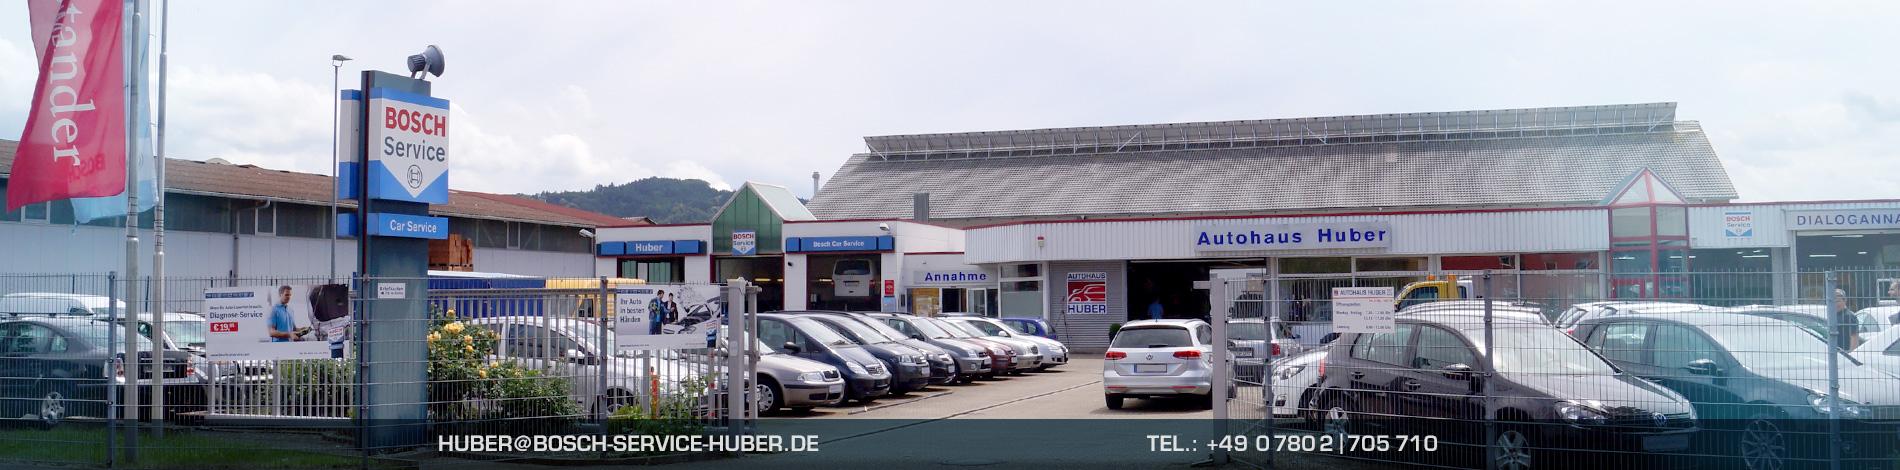 Willkommen beim Autohaus Huber/Bosch Car Service Oberkirch